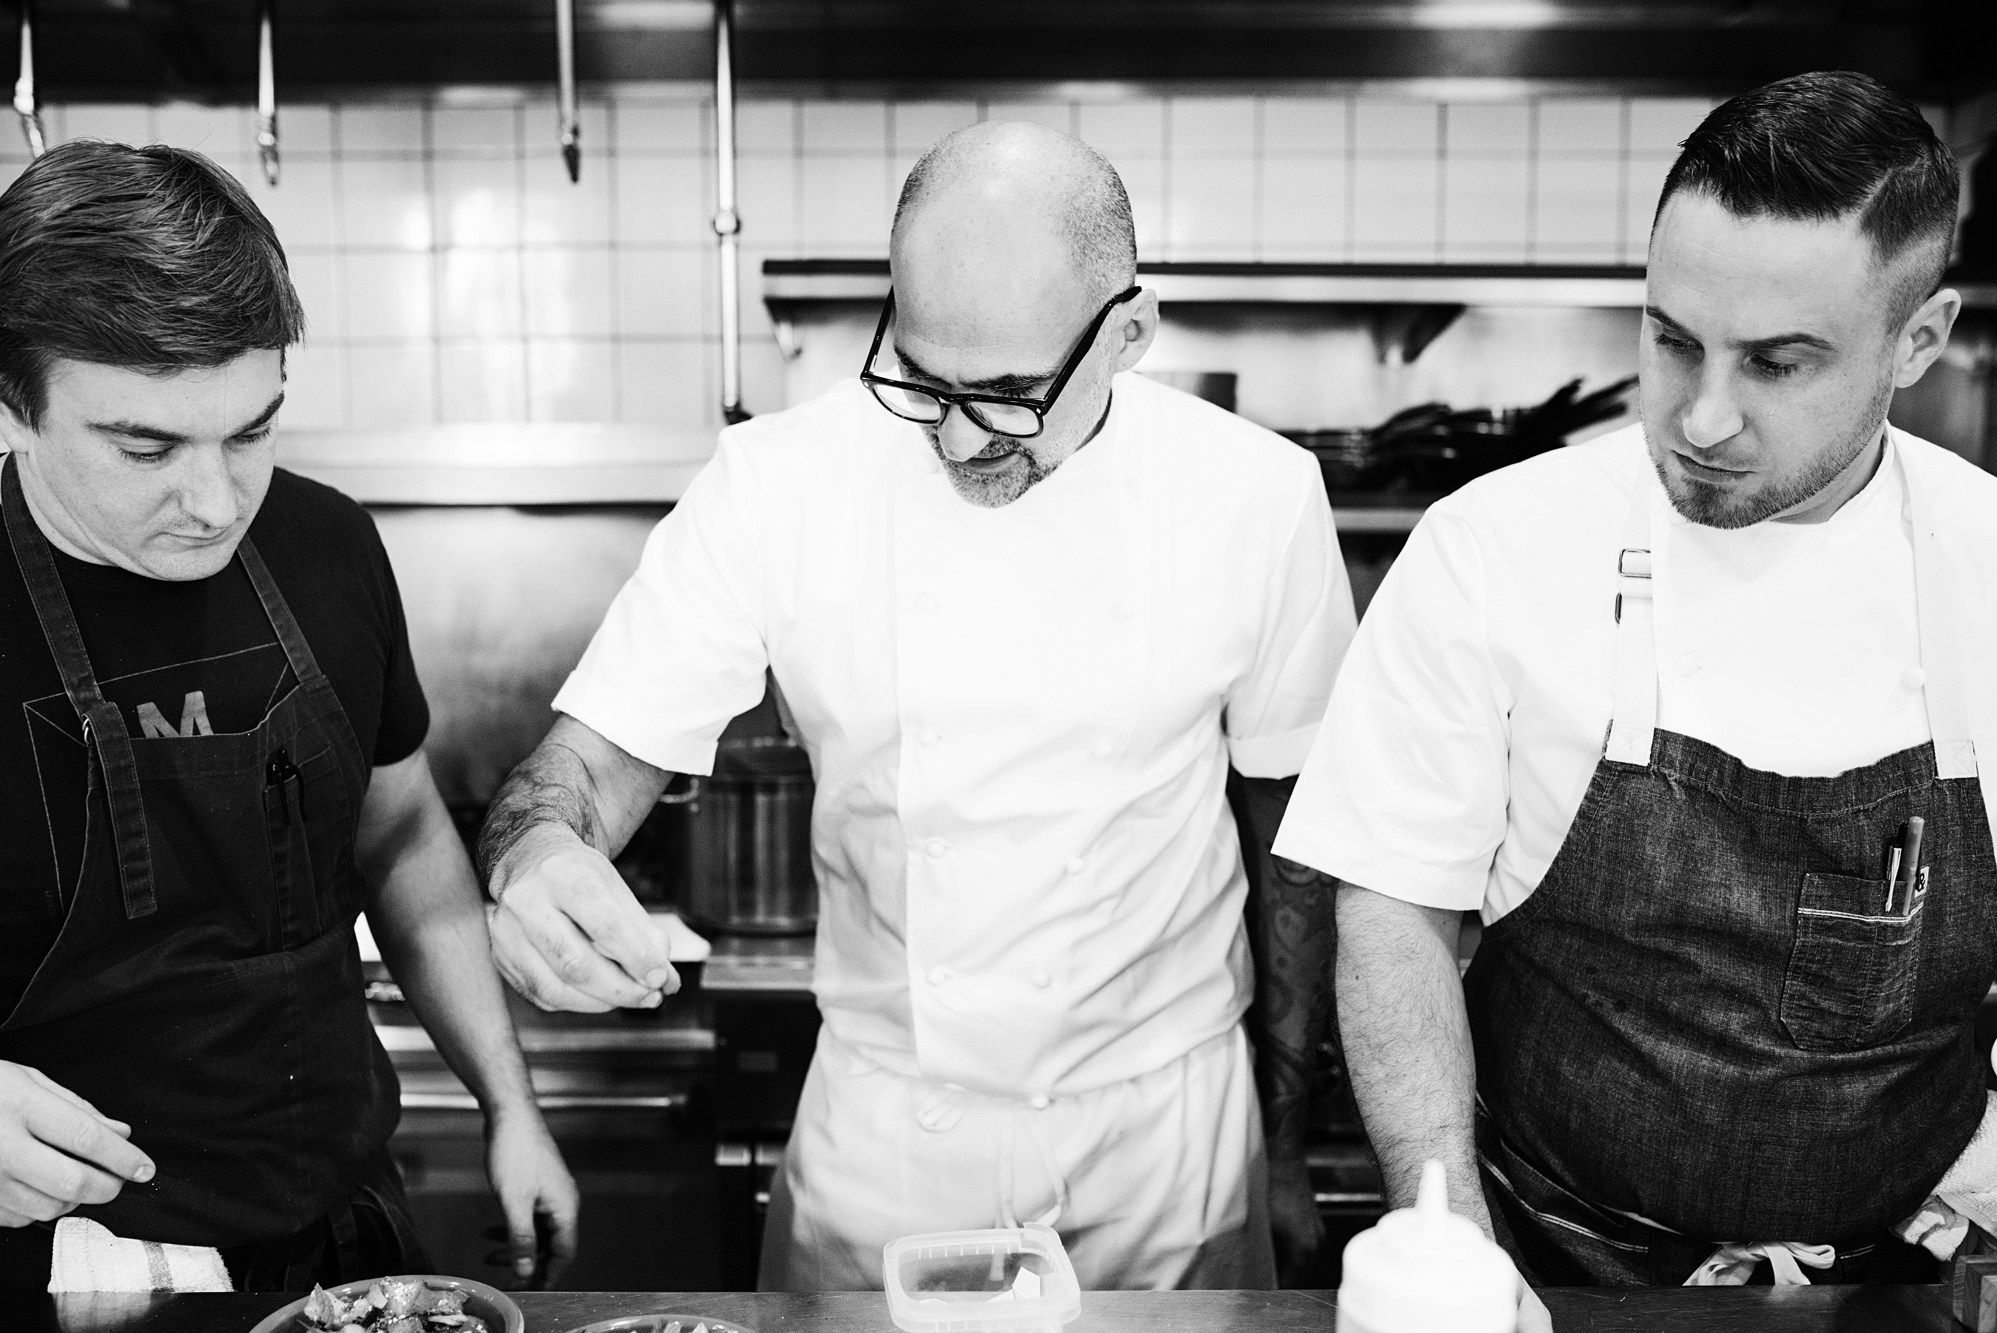 Chefs at Martina with Daniel del Prado | Martina | The Restaurant Project